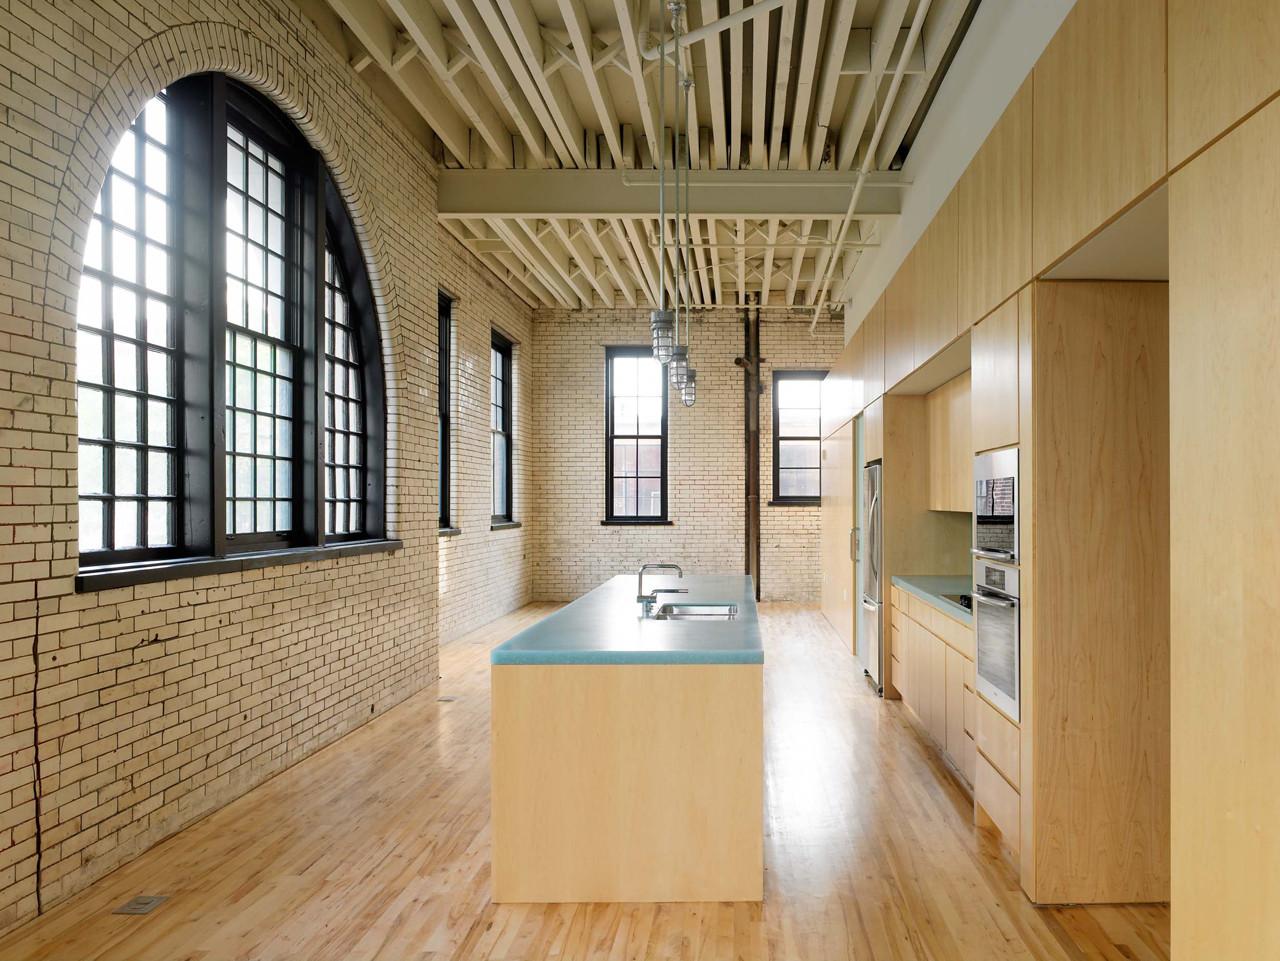 Yale Steam Laundry Condominiums / John Ronan Architects, © Nathan Kirkman